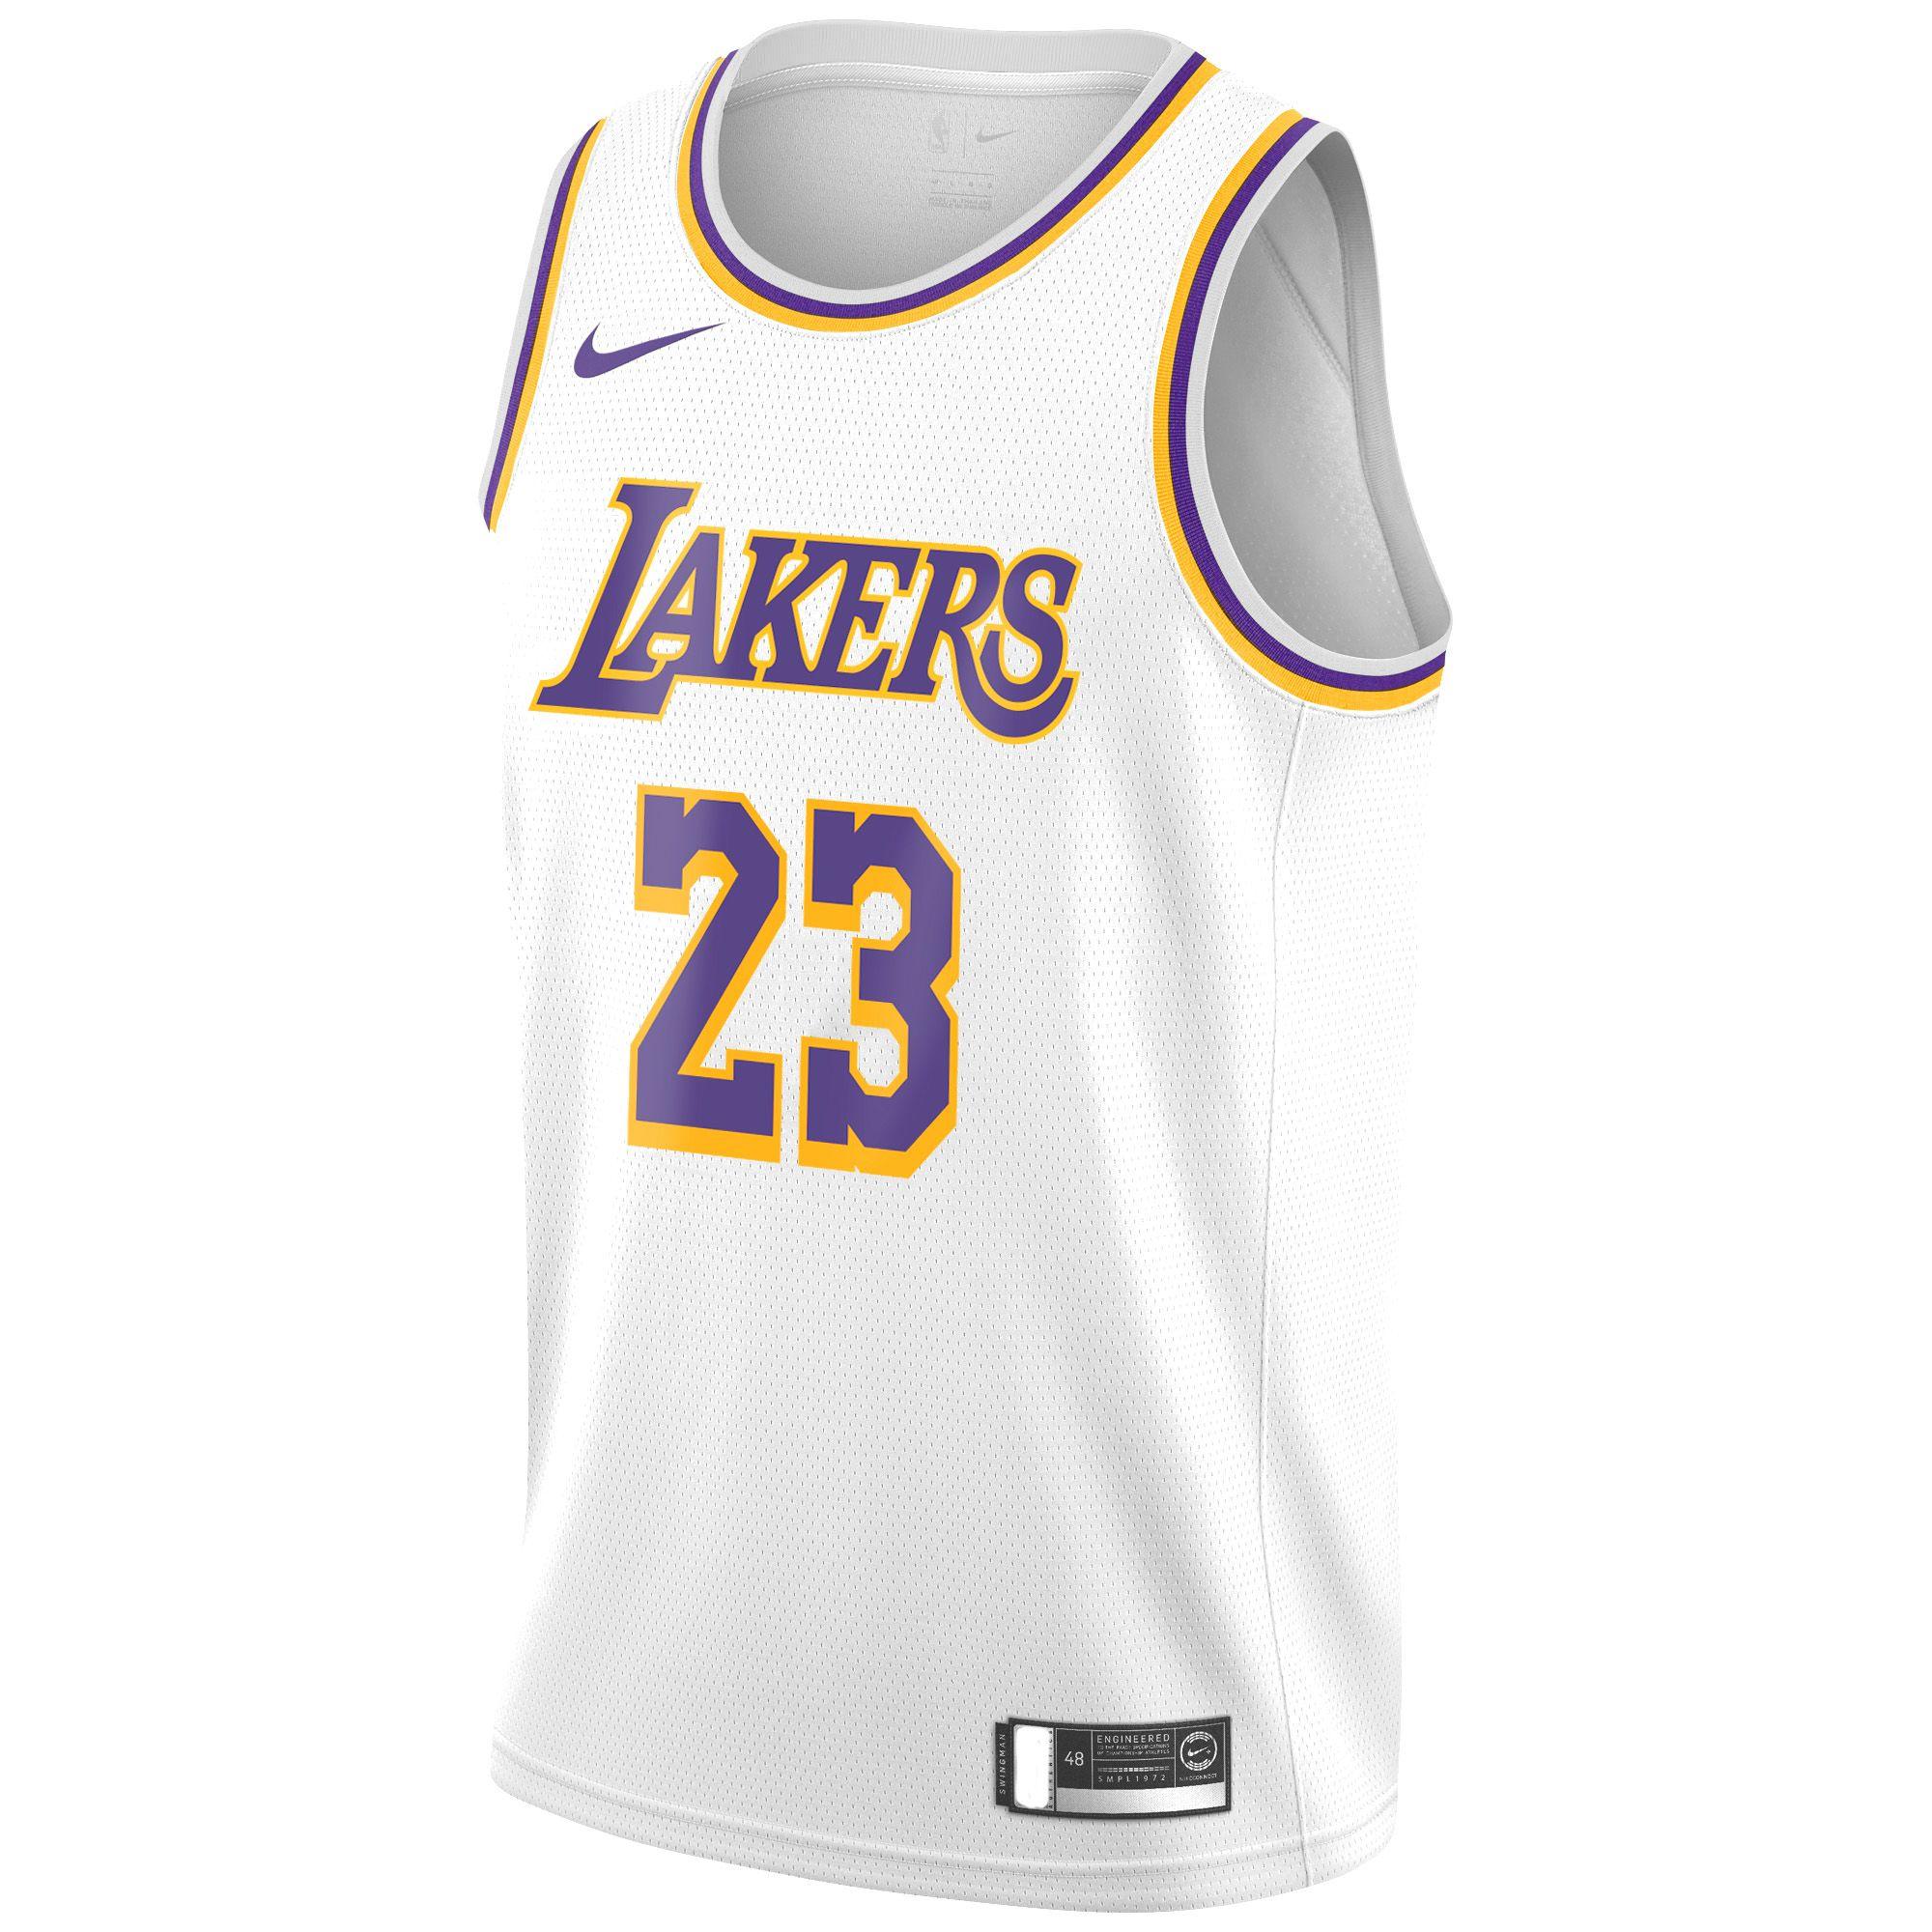 Nike Lebron James Lakers Jersey In 2020 La Lakers Jersey Lebron James Los Angeles Lakers